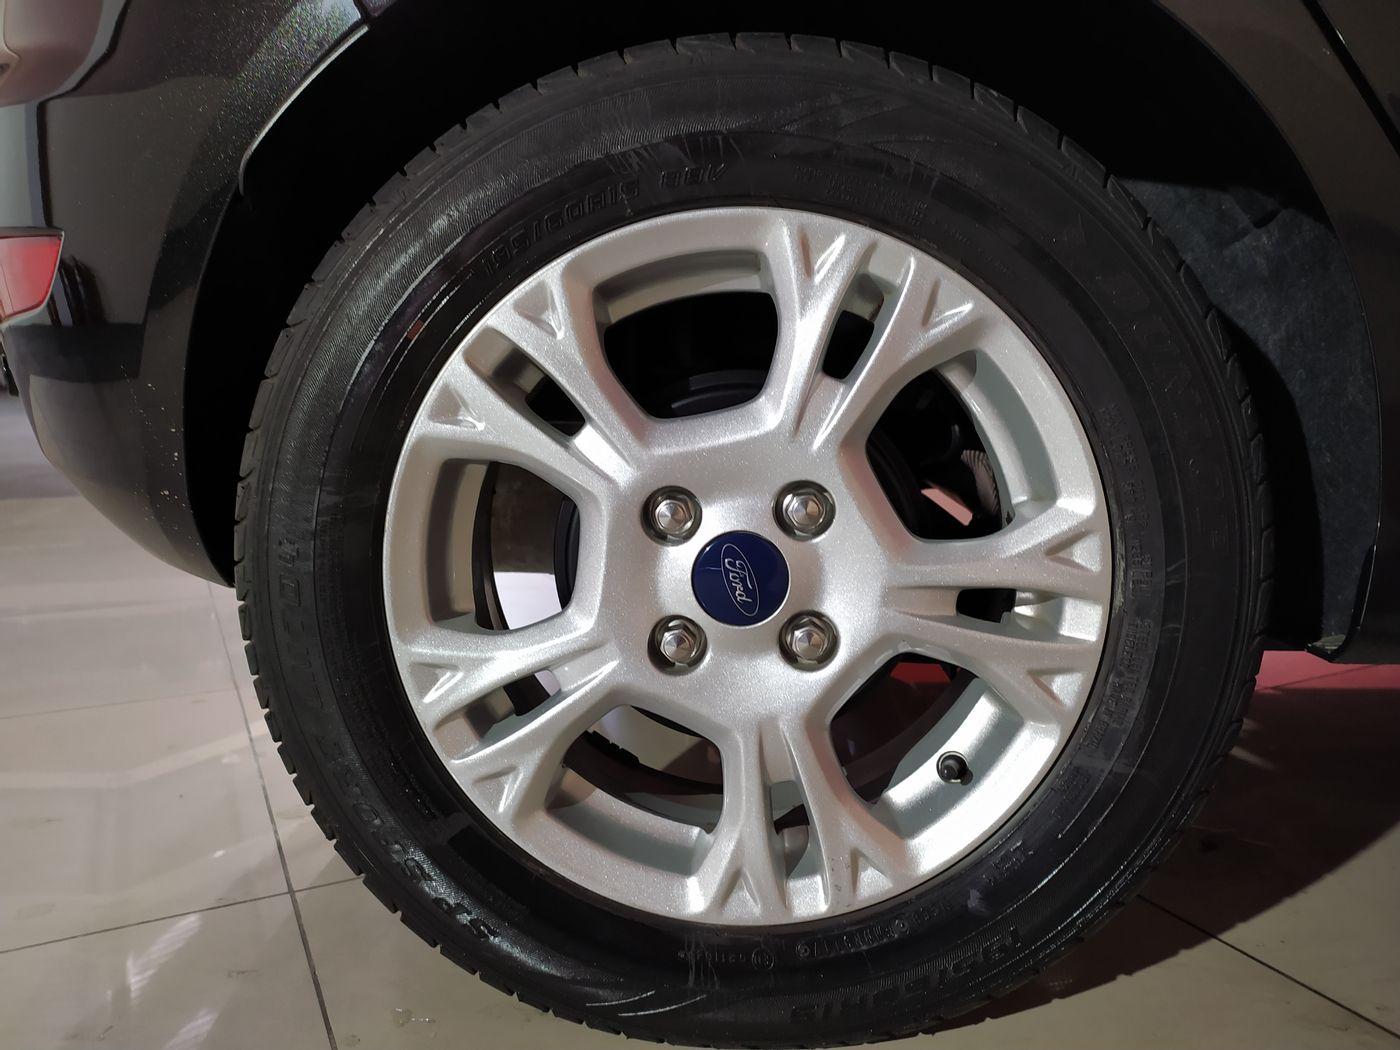 Ford Fiesta SEL 1.0 12V EcoBoost Aut. 5p